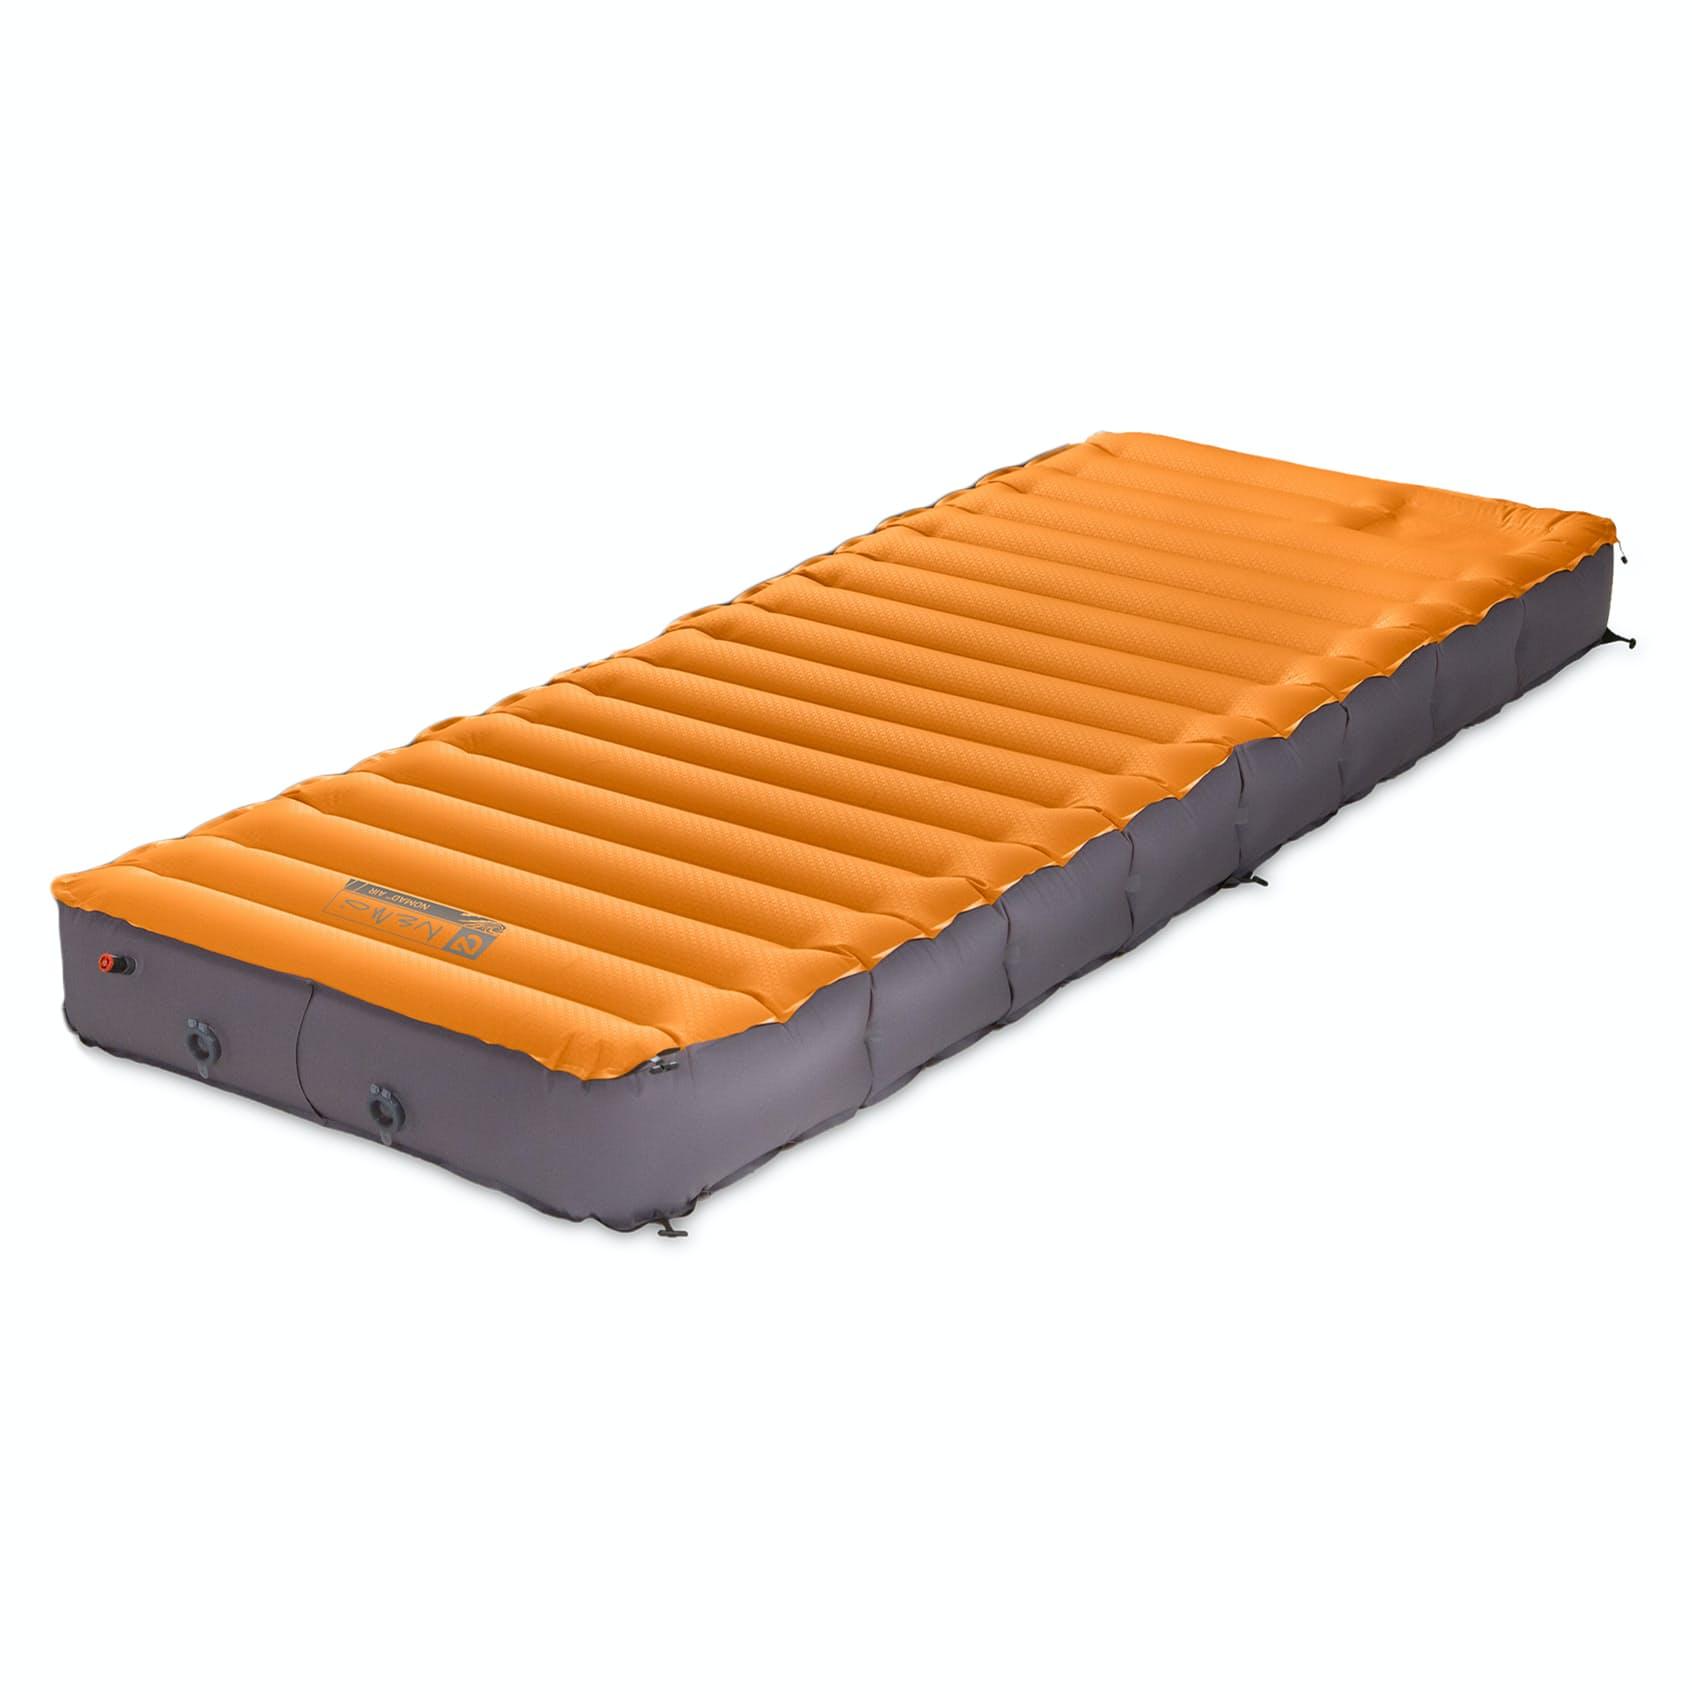 Io5wifr7yq nemo equipment nomad air 30xl sleeping mattress 0 original